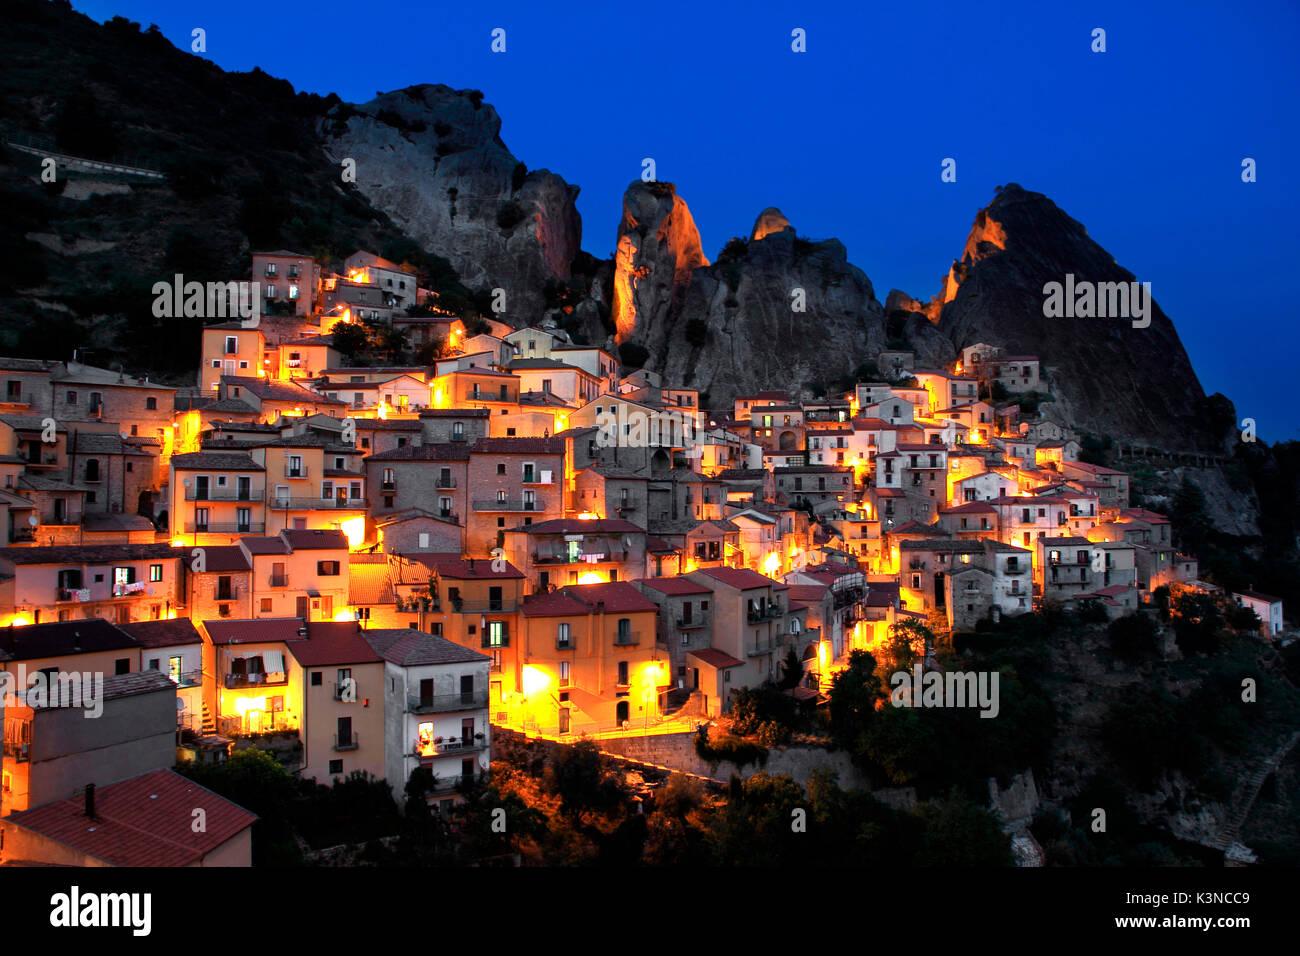 Castelmezzano village by night, Potenza district, Basilicata, Italy Stock Photo